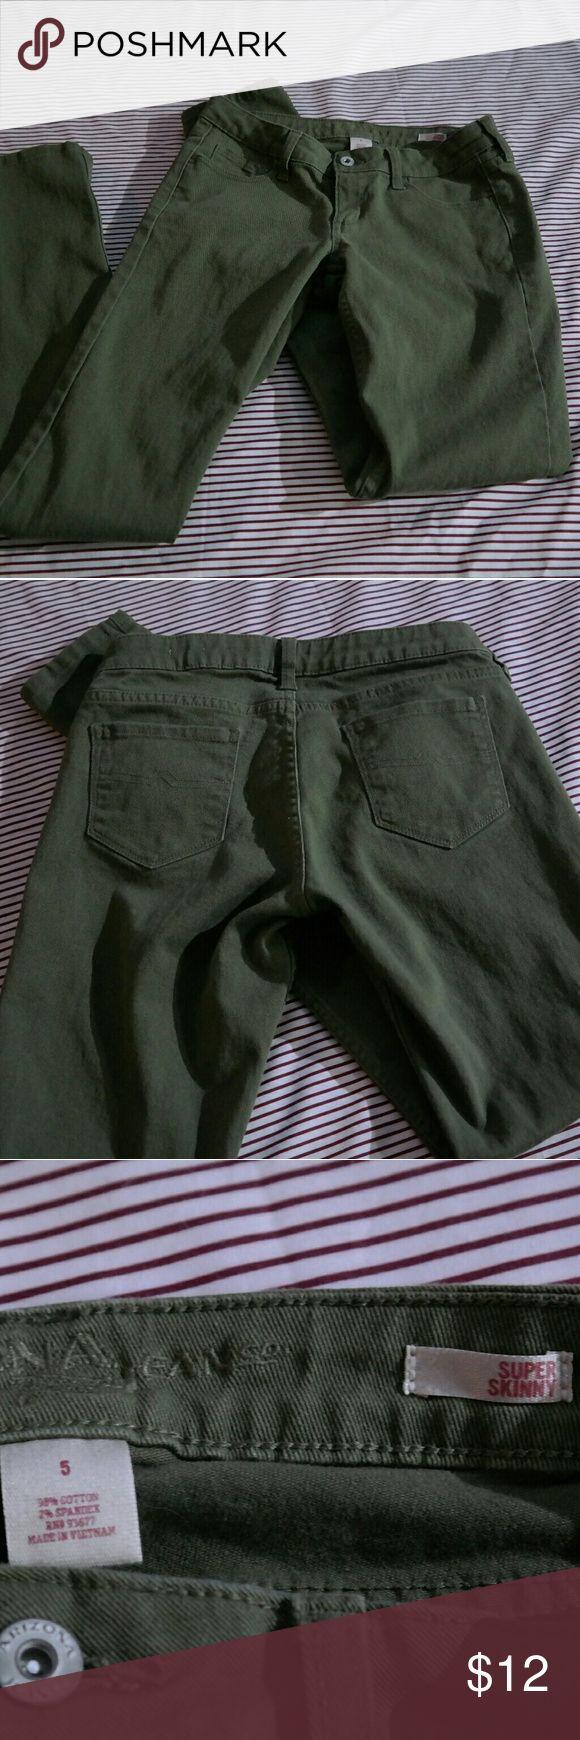 Arizona Jean Co. Olive Skinny Jeans Olive green super skinny jeans. Like new, never worn. Arizona Jean Company Jeans Skinny